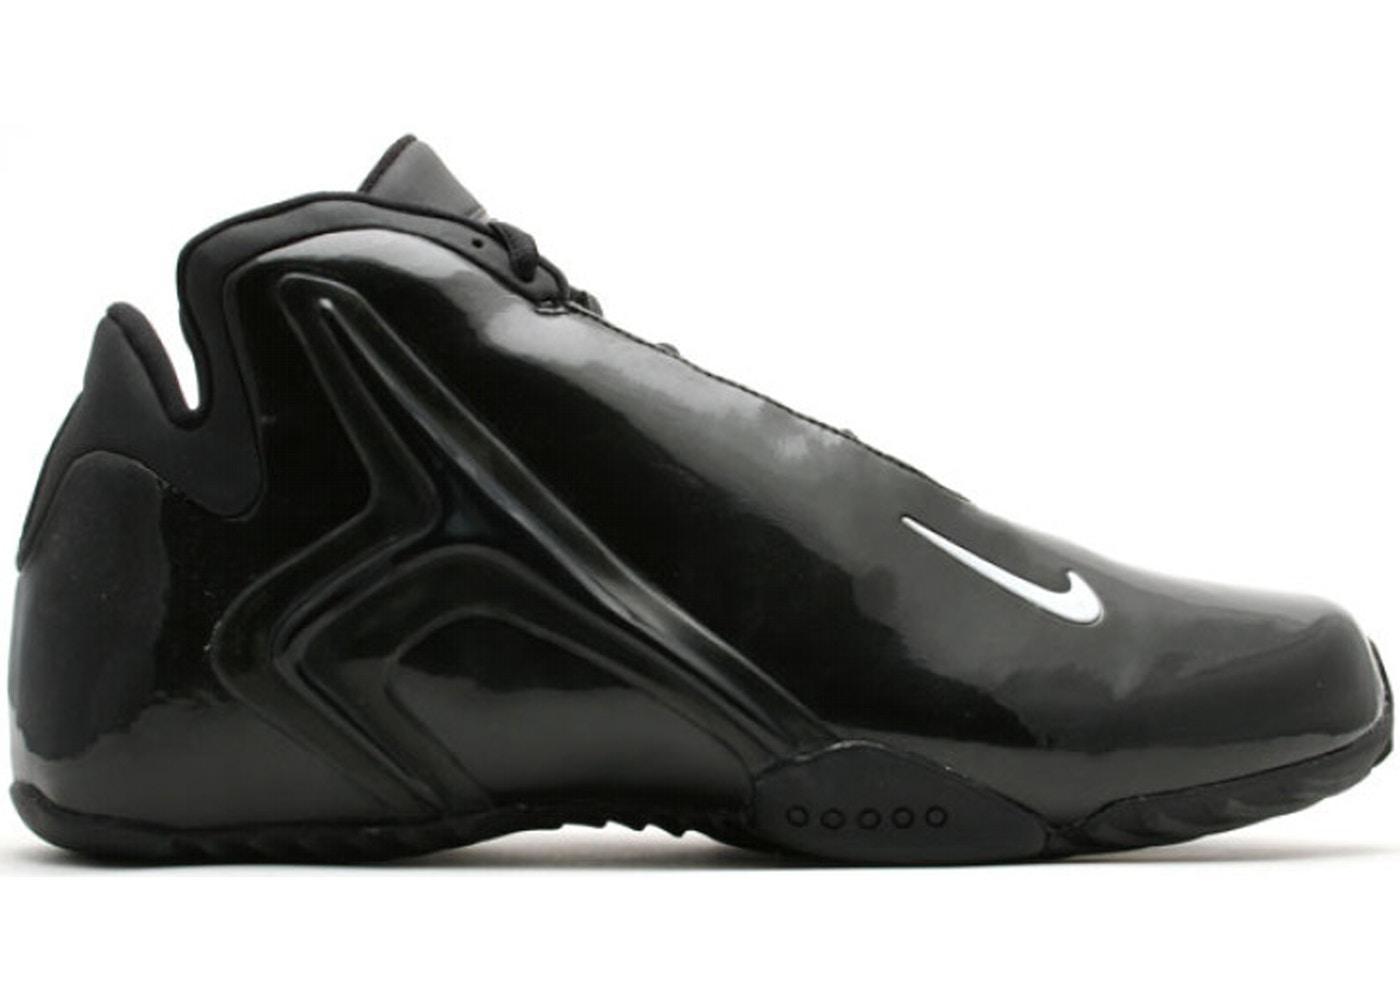 sports shoes d6699 27b87 Air Hyperflight Black White - 830252-311